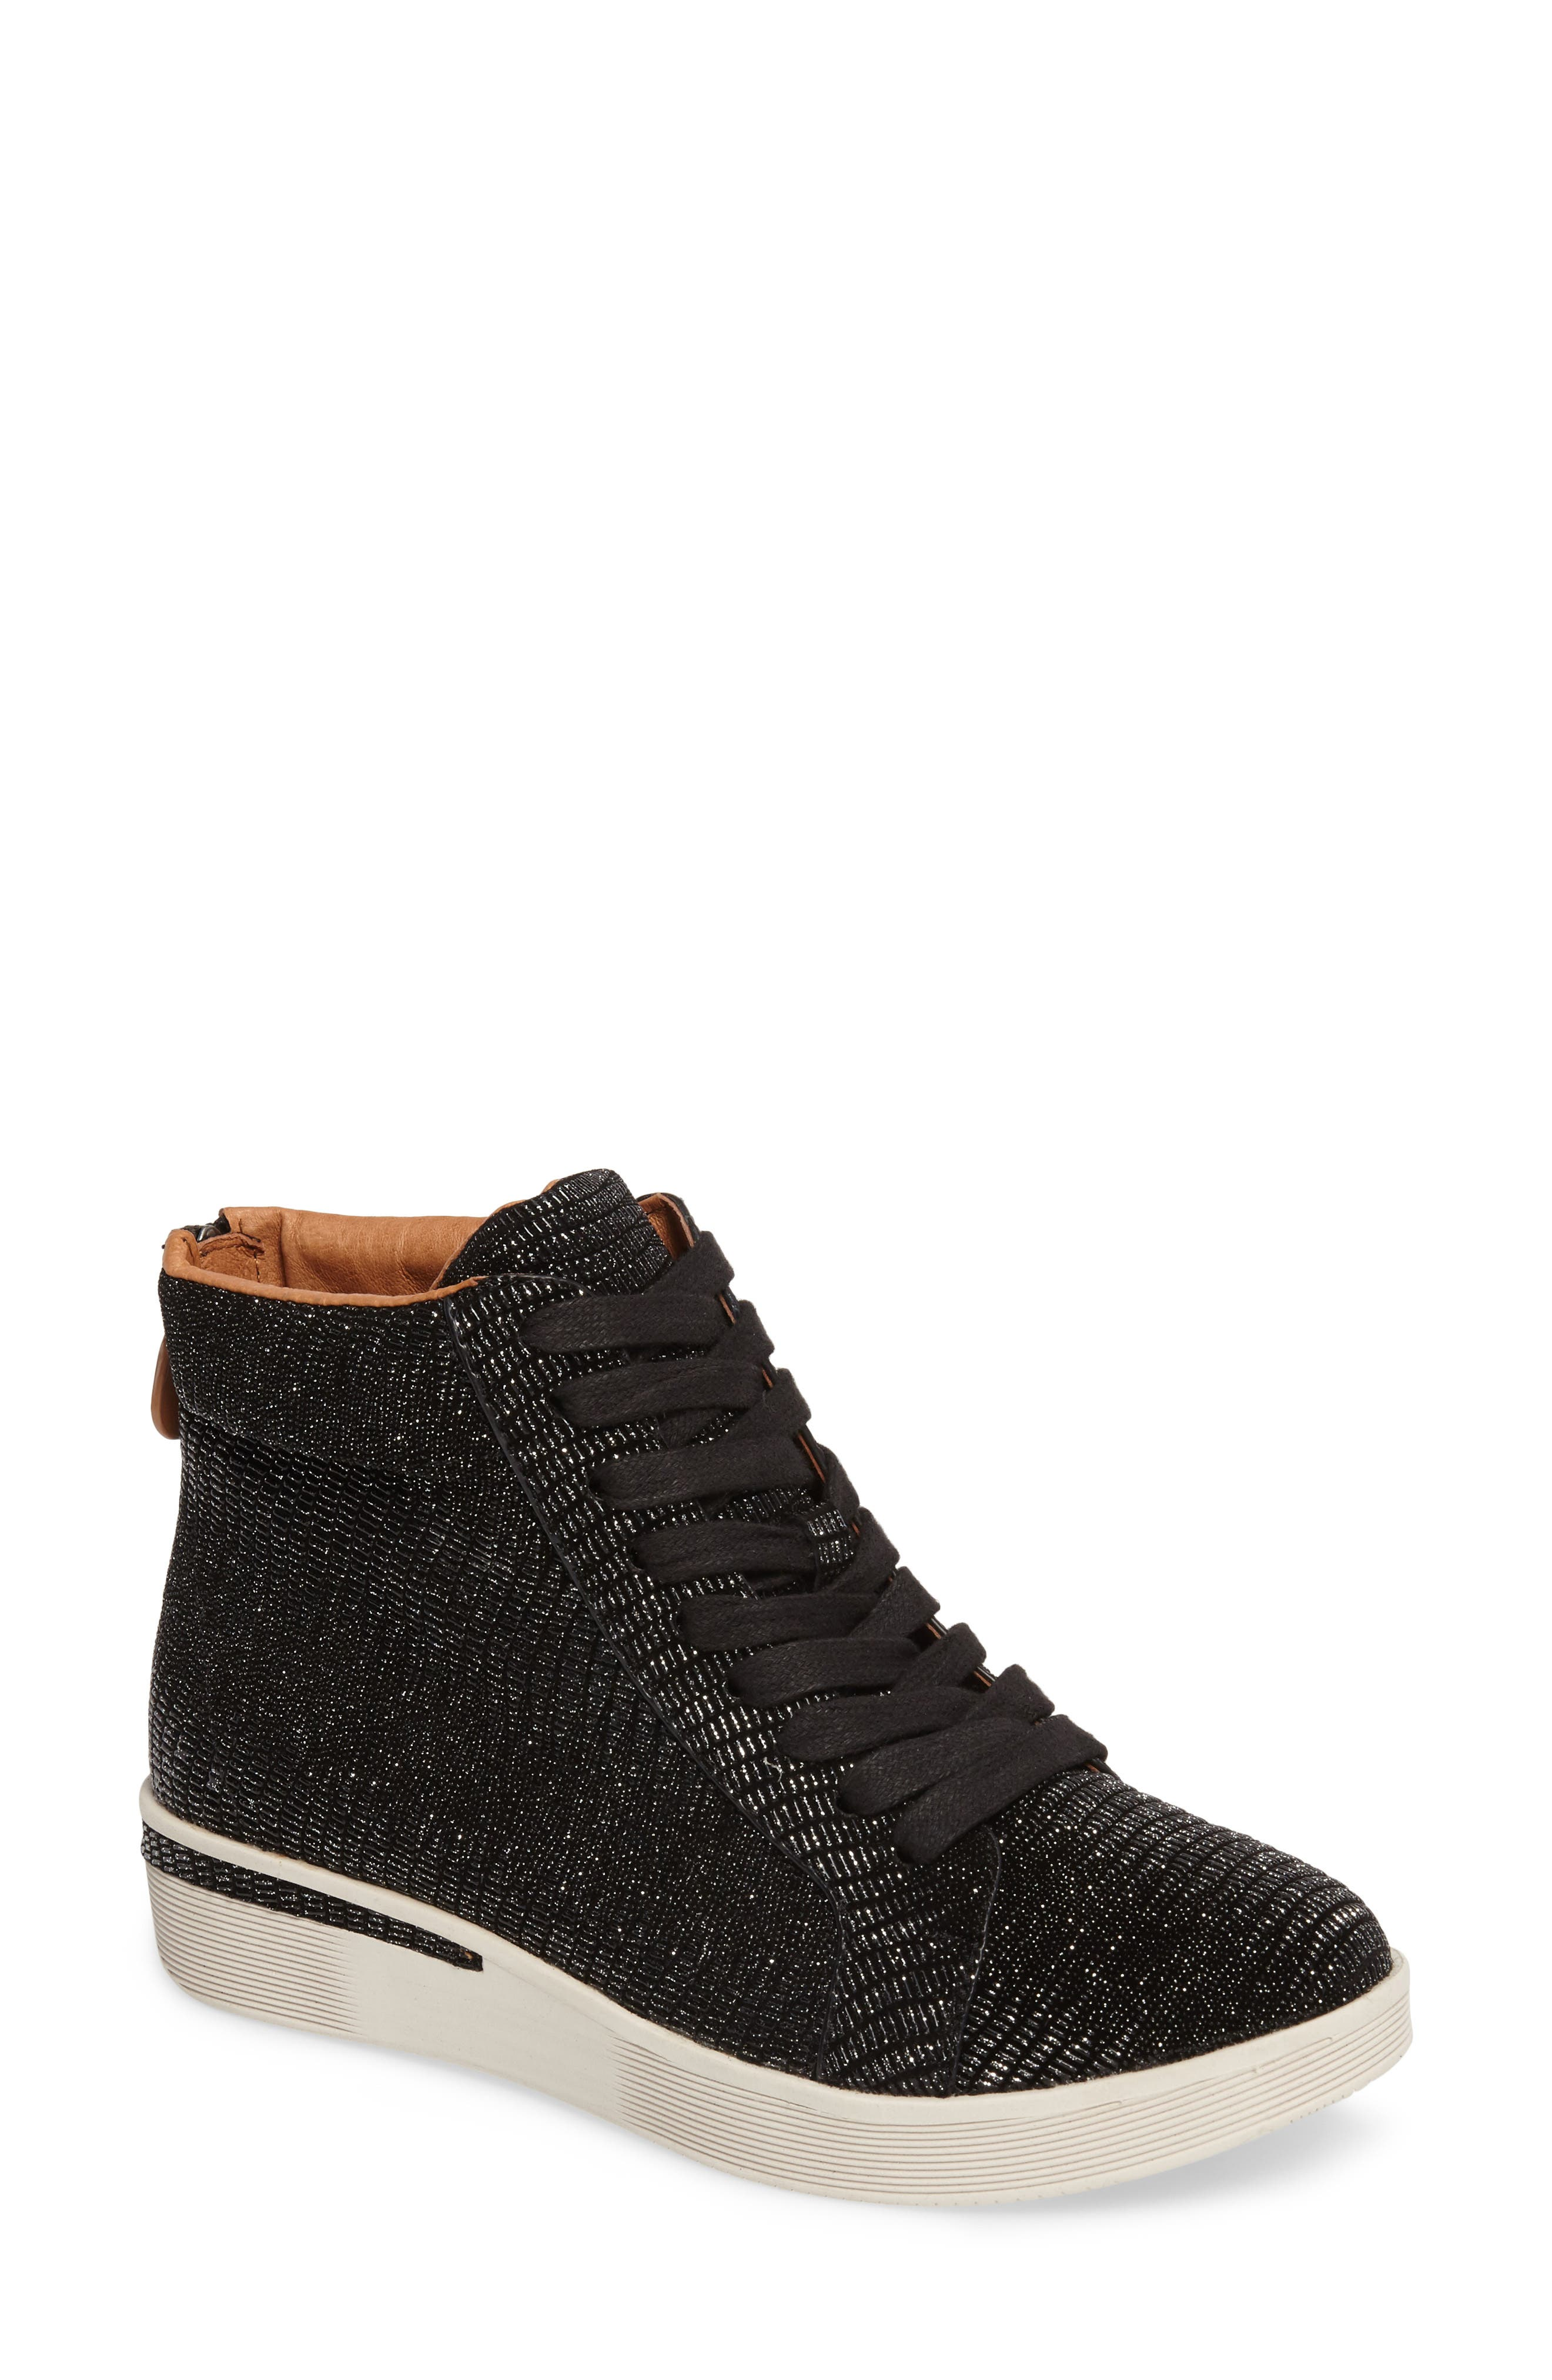 Helka High Top Sneaker,                         Main,                         color, Black Metallic Leather